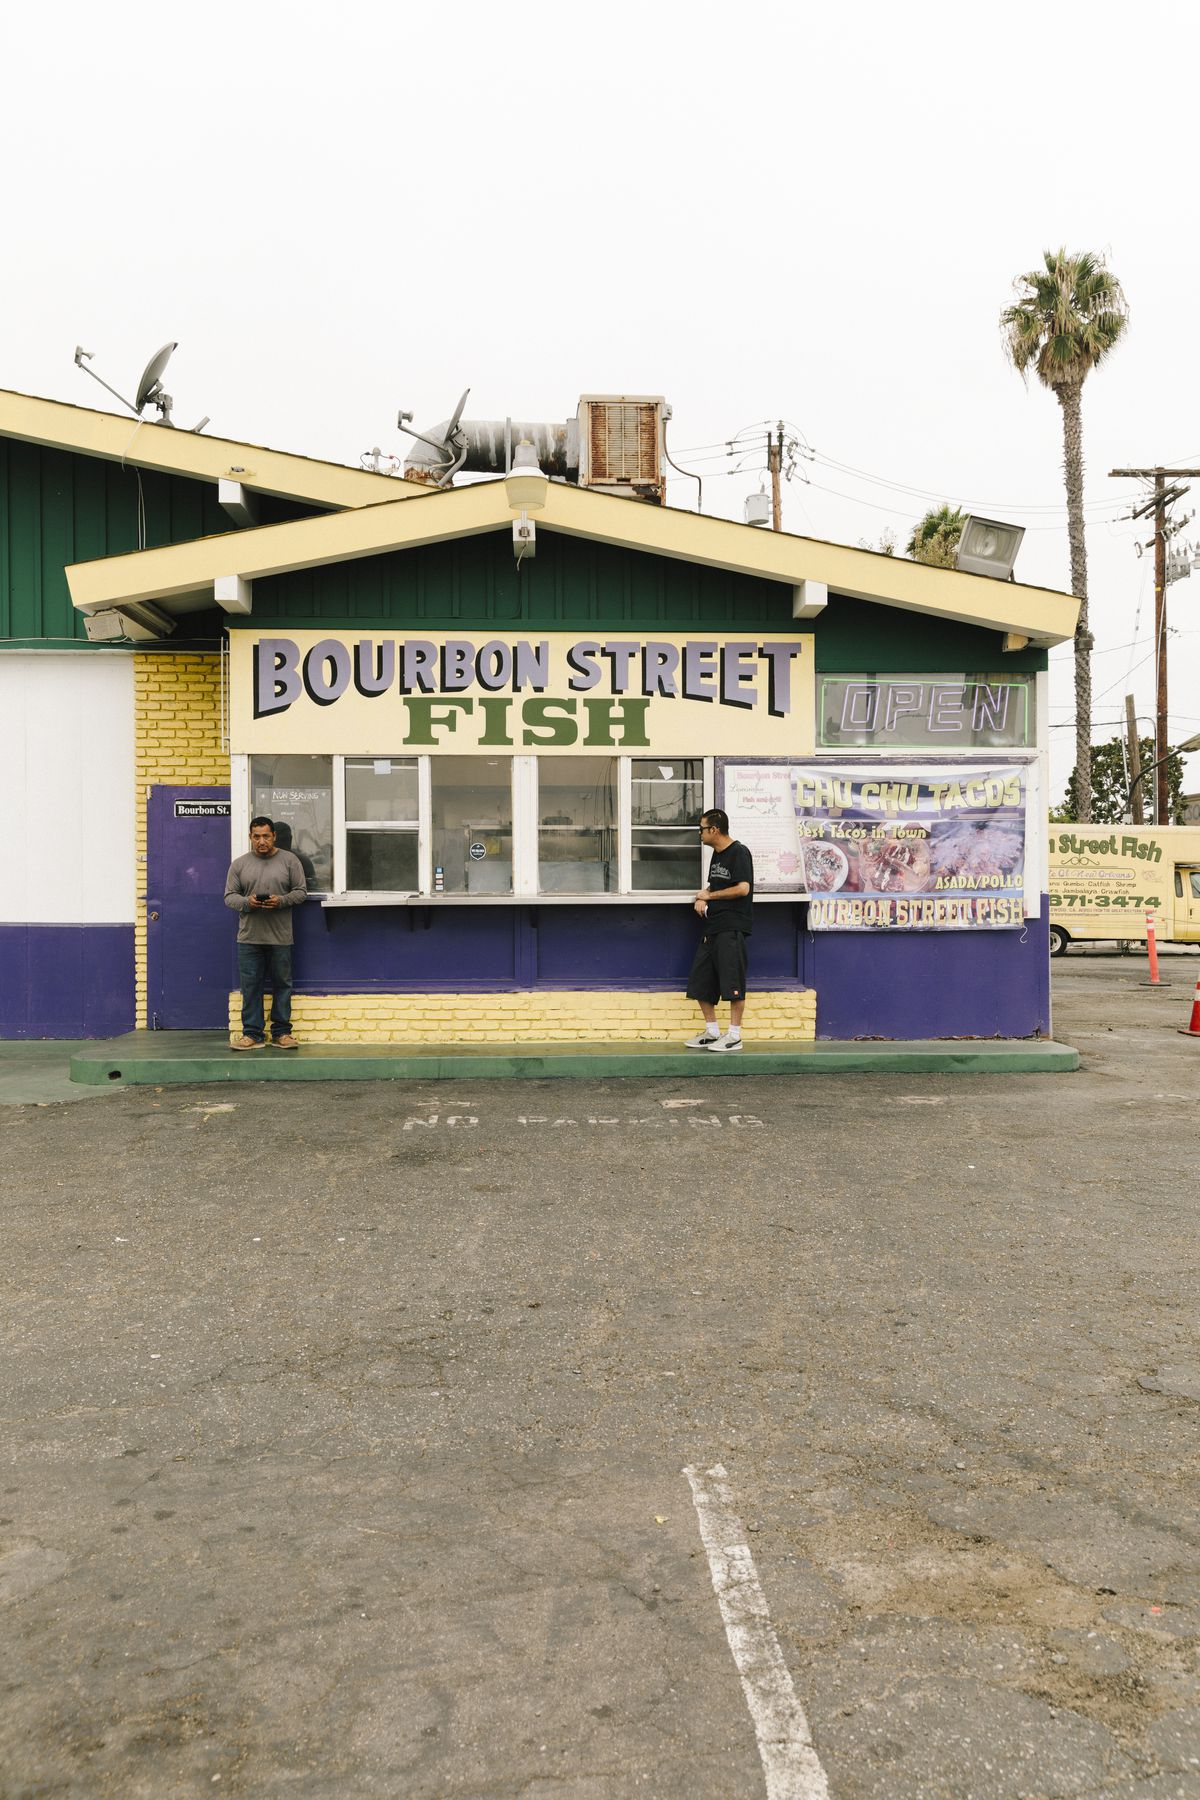 Bourbon Street Fish in Inglewood, California